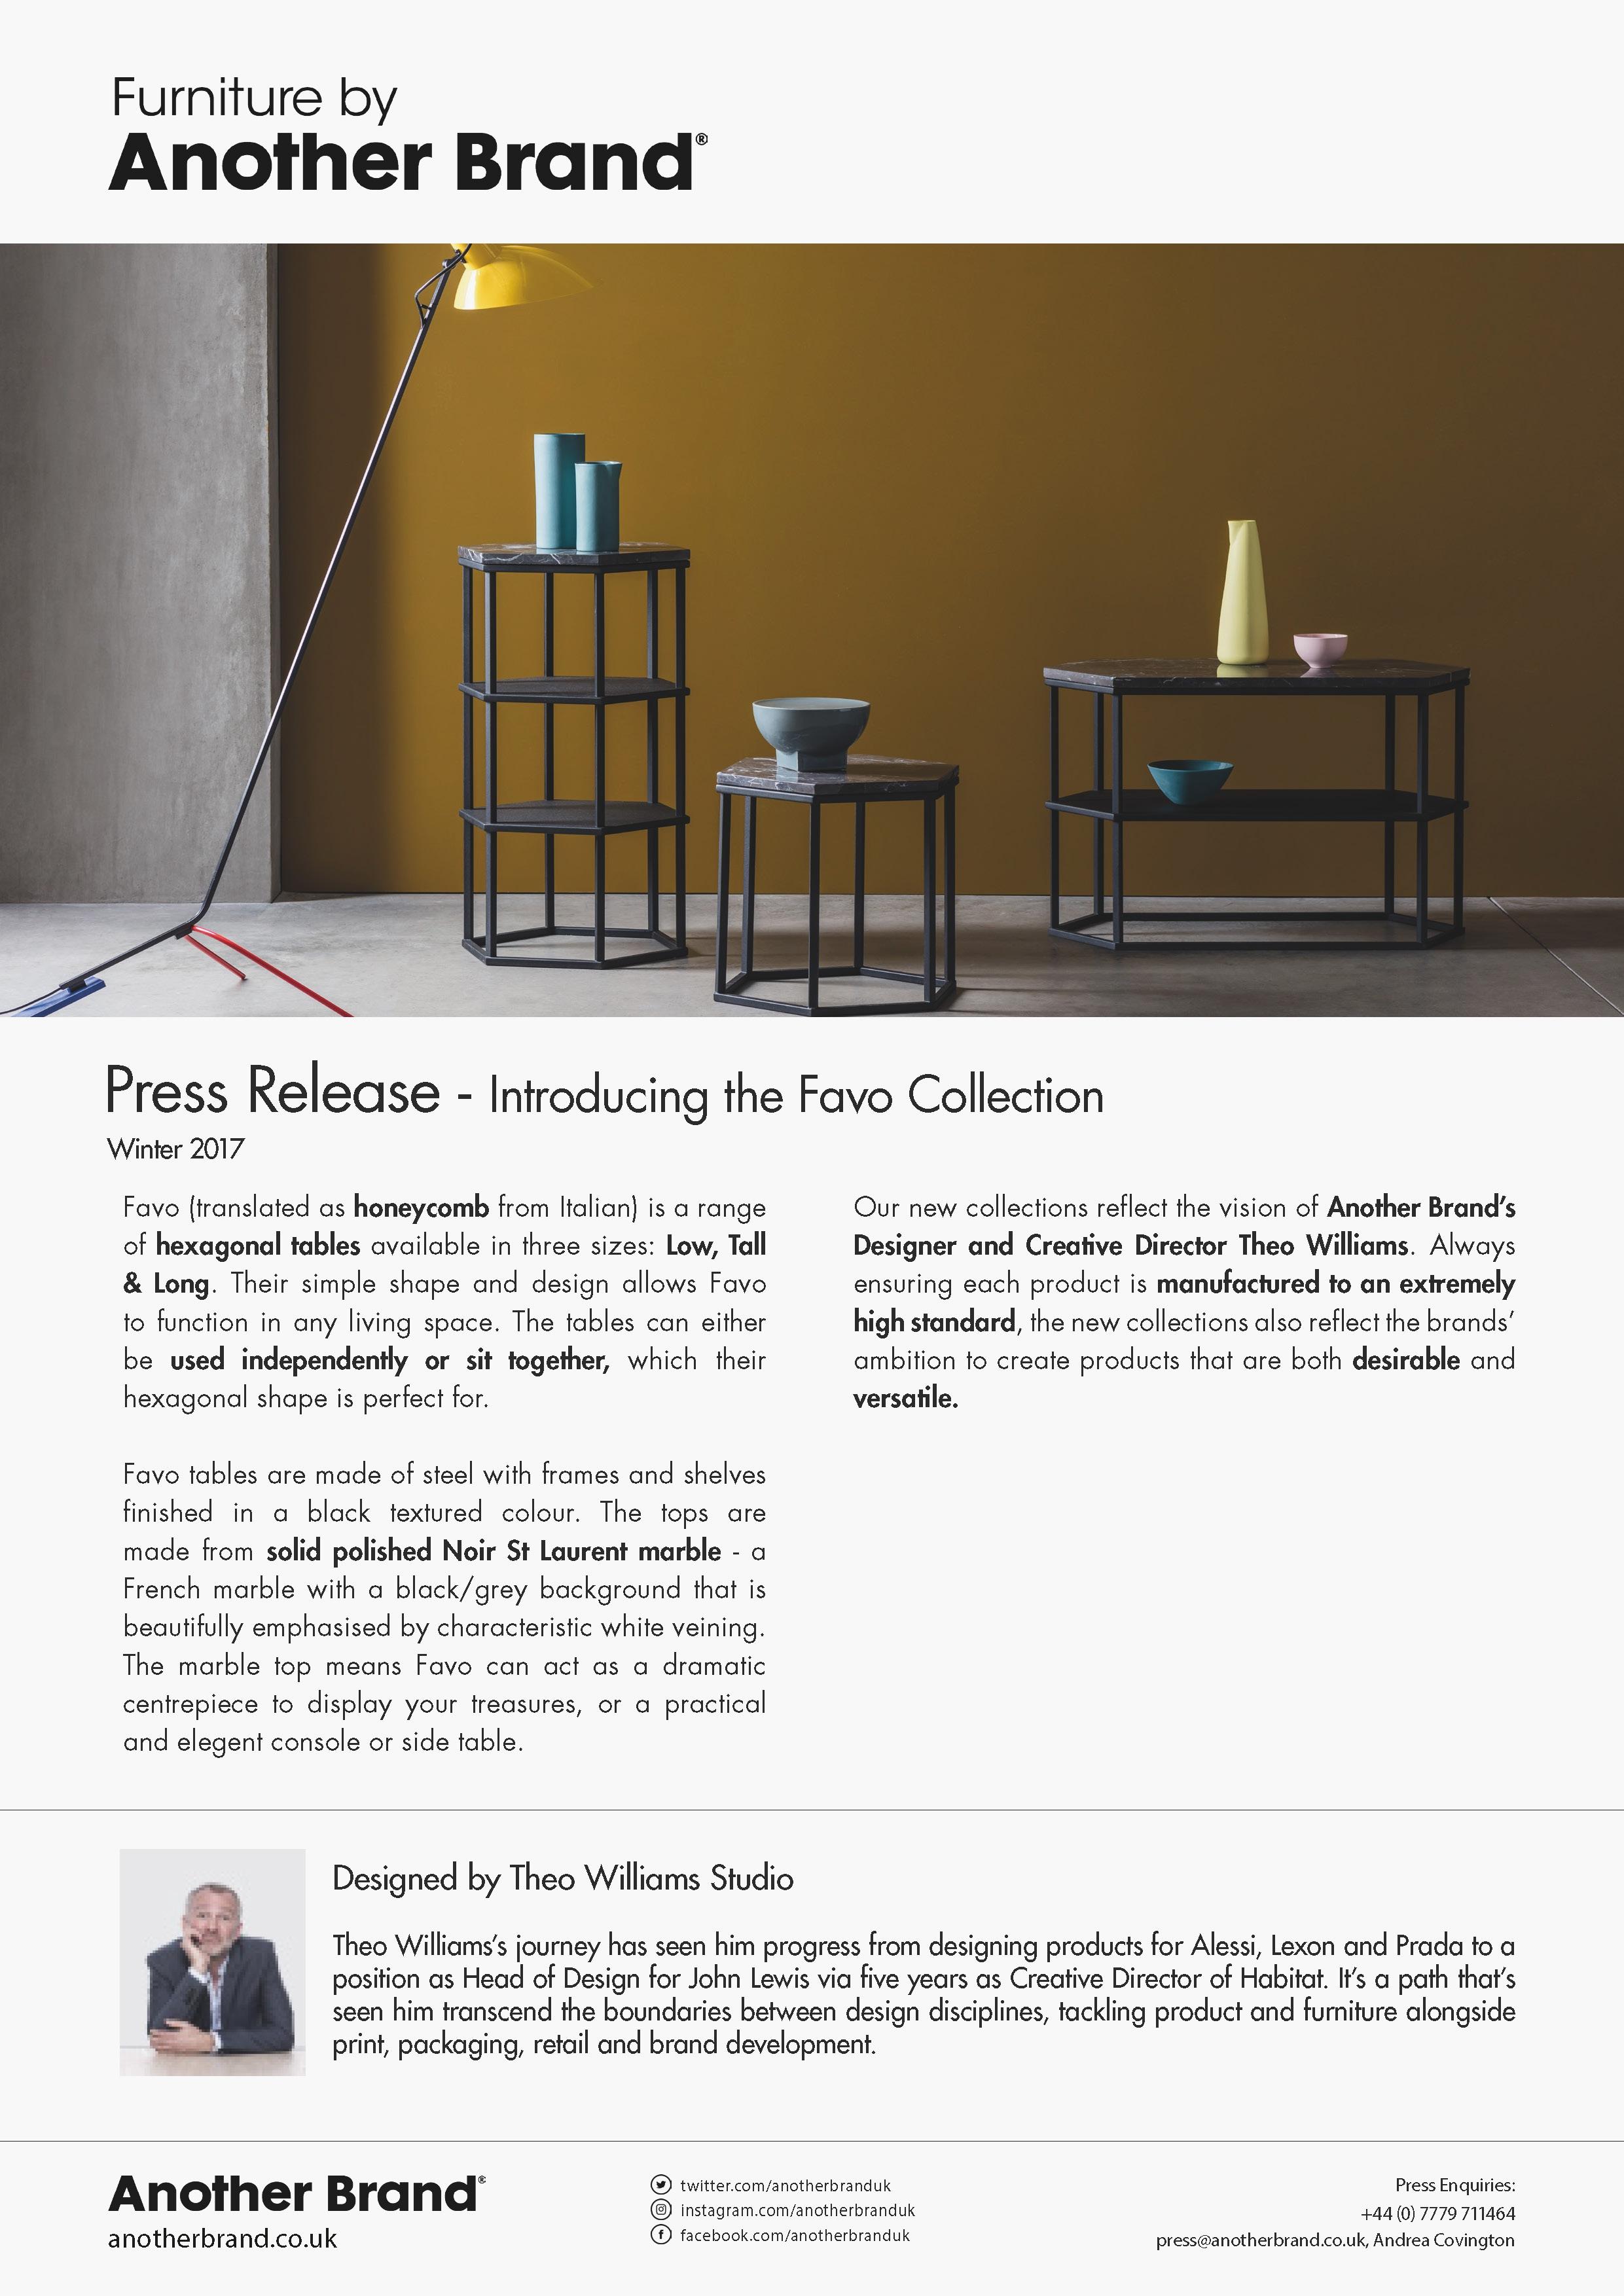 Another Brand_PressRelease_Favo.jpg